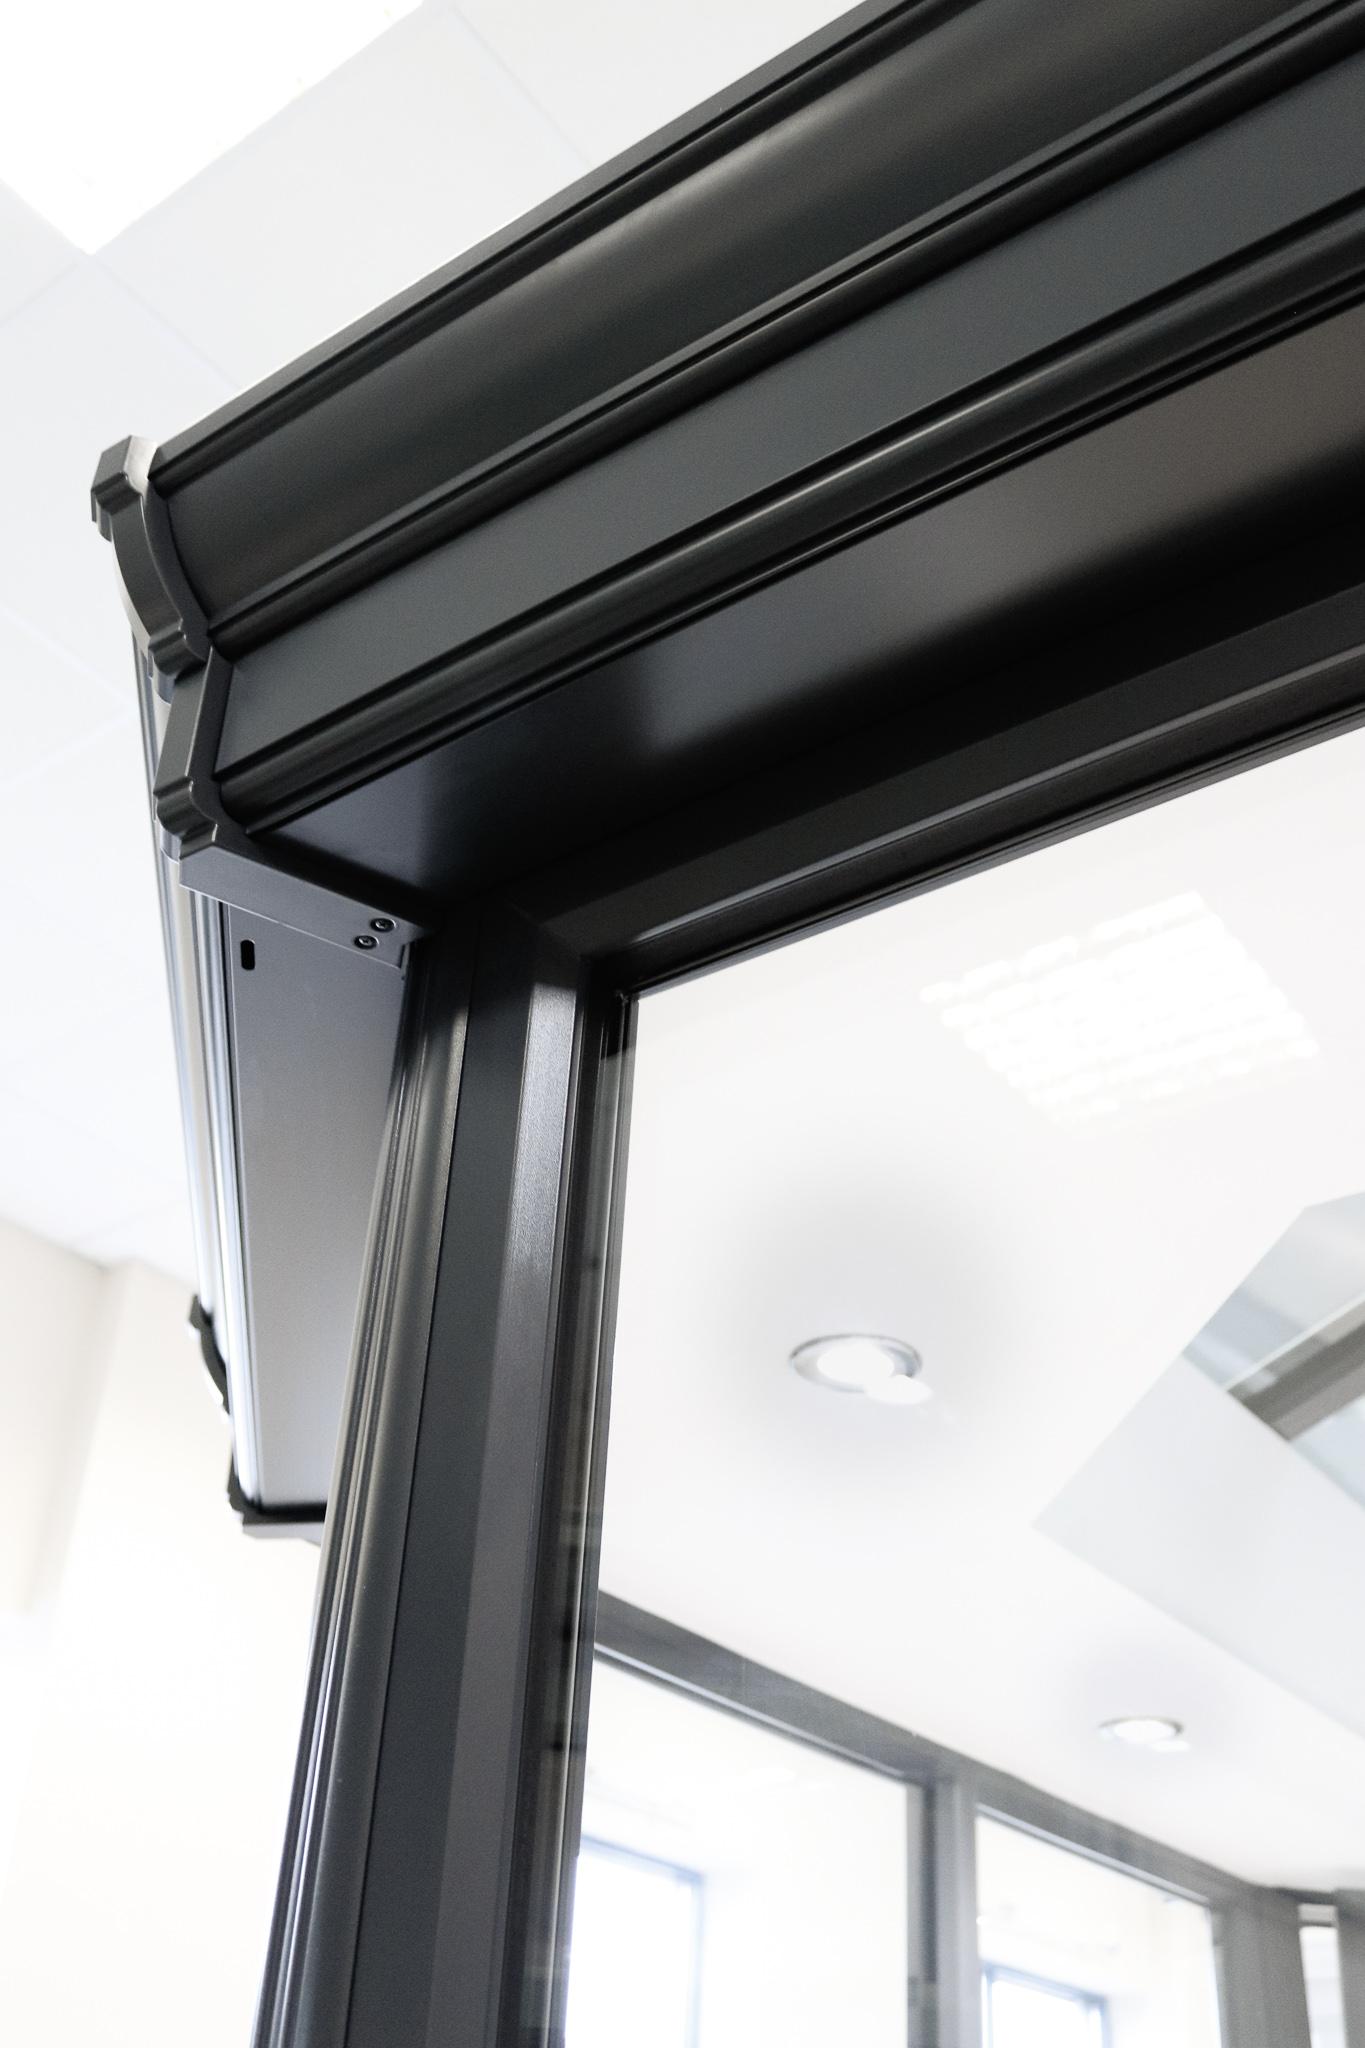 Image of black new window frame.